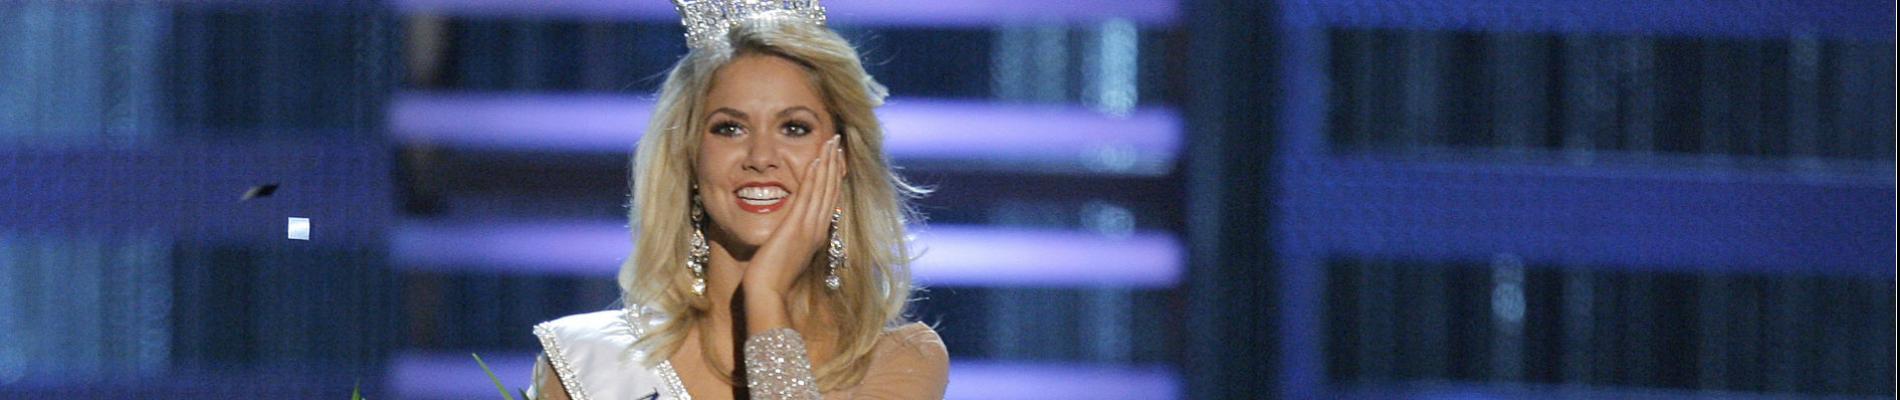 Miss America!